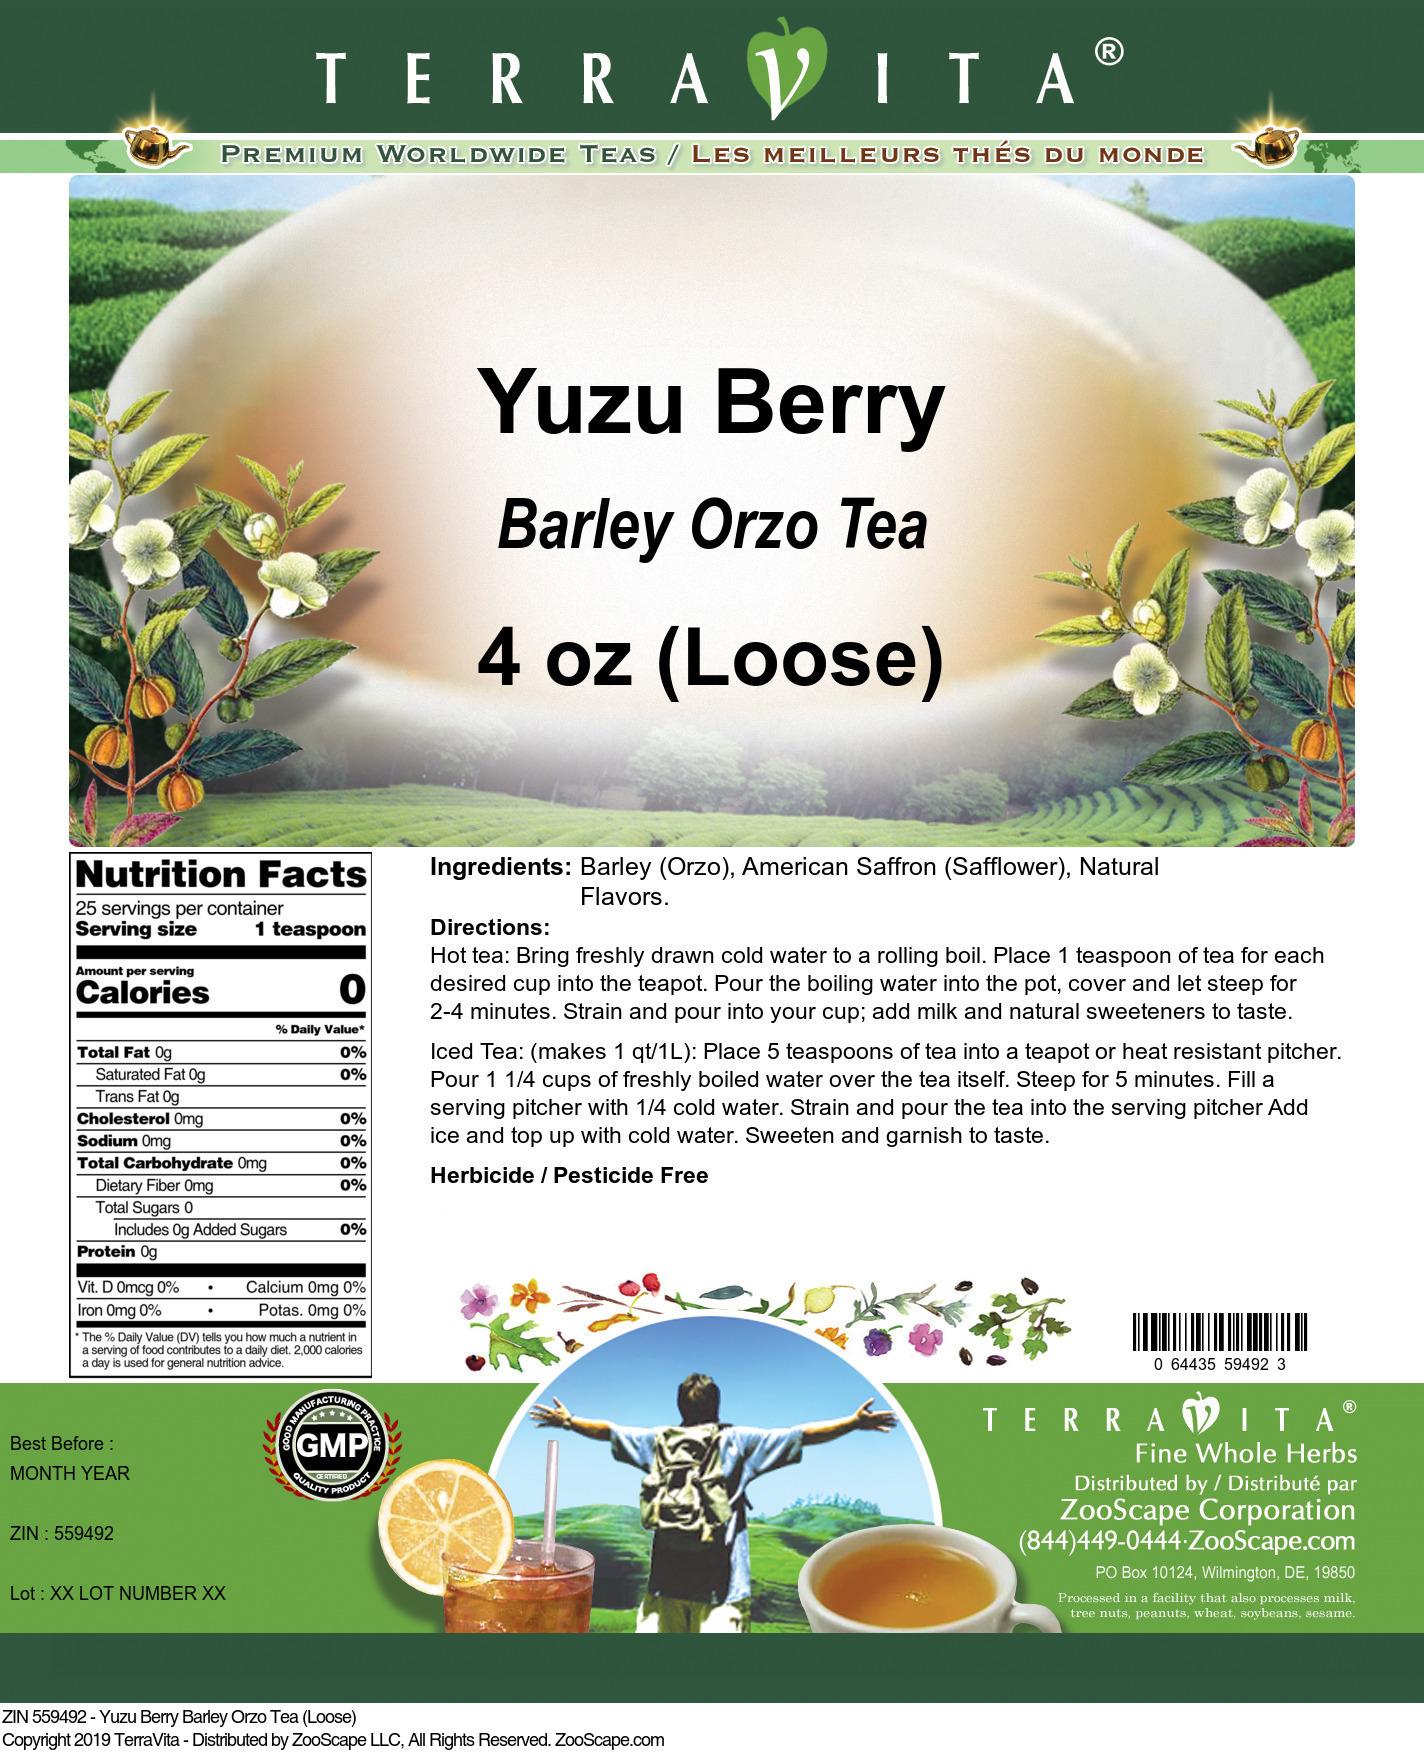 Yuzu Berry Barley Orzo Tea (Loose)